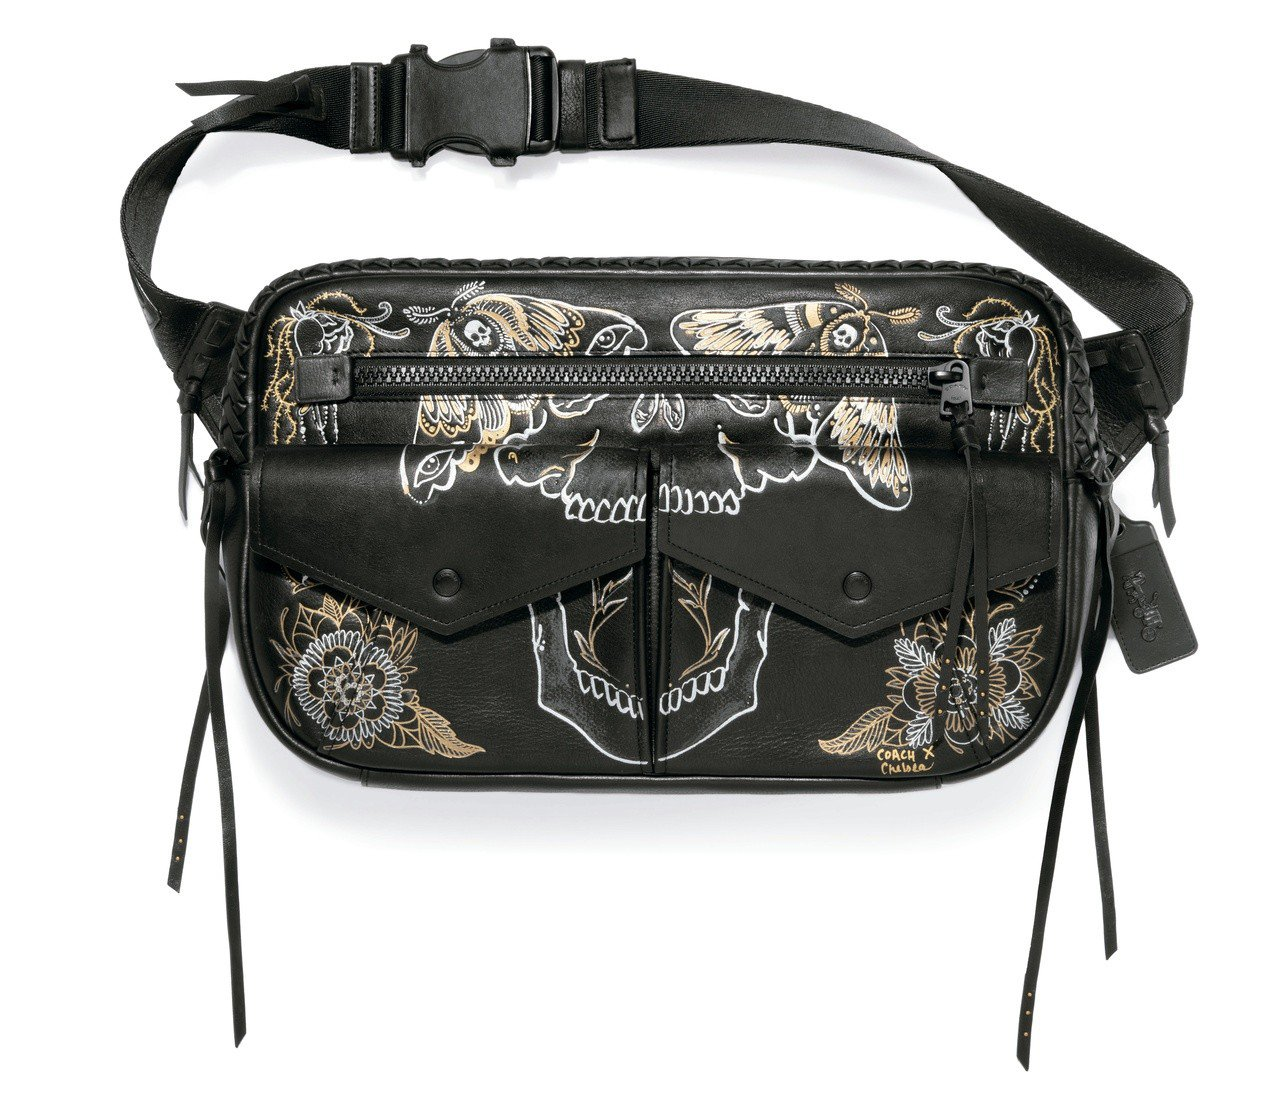 COACH刺青腰包,售價25,800元。圖/COACH提供